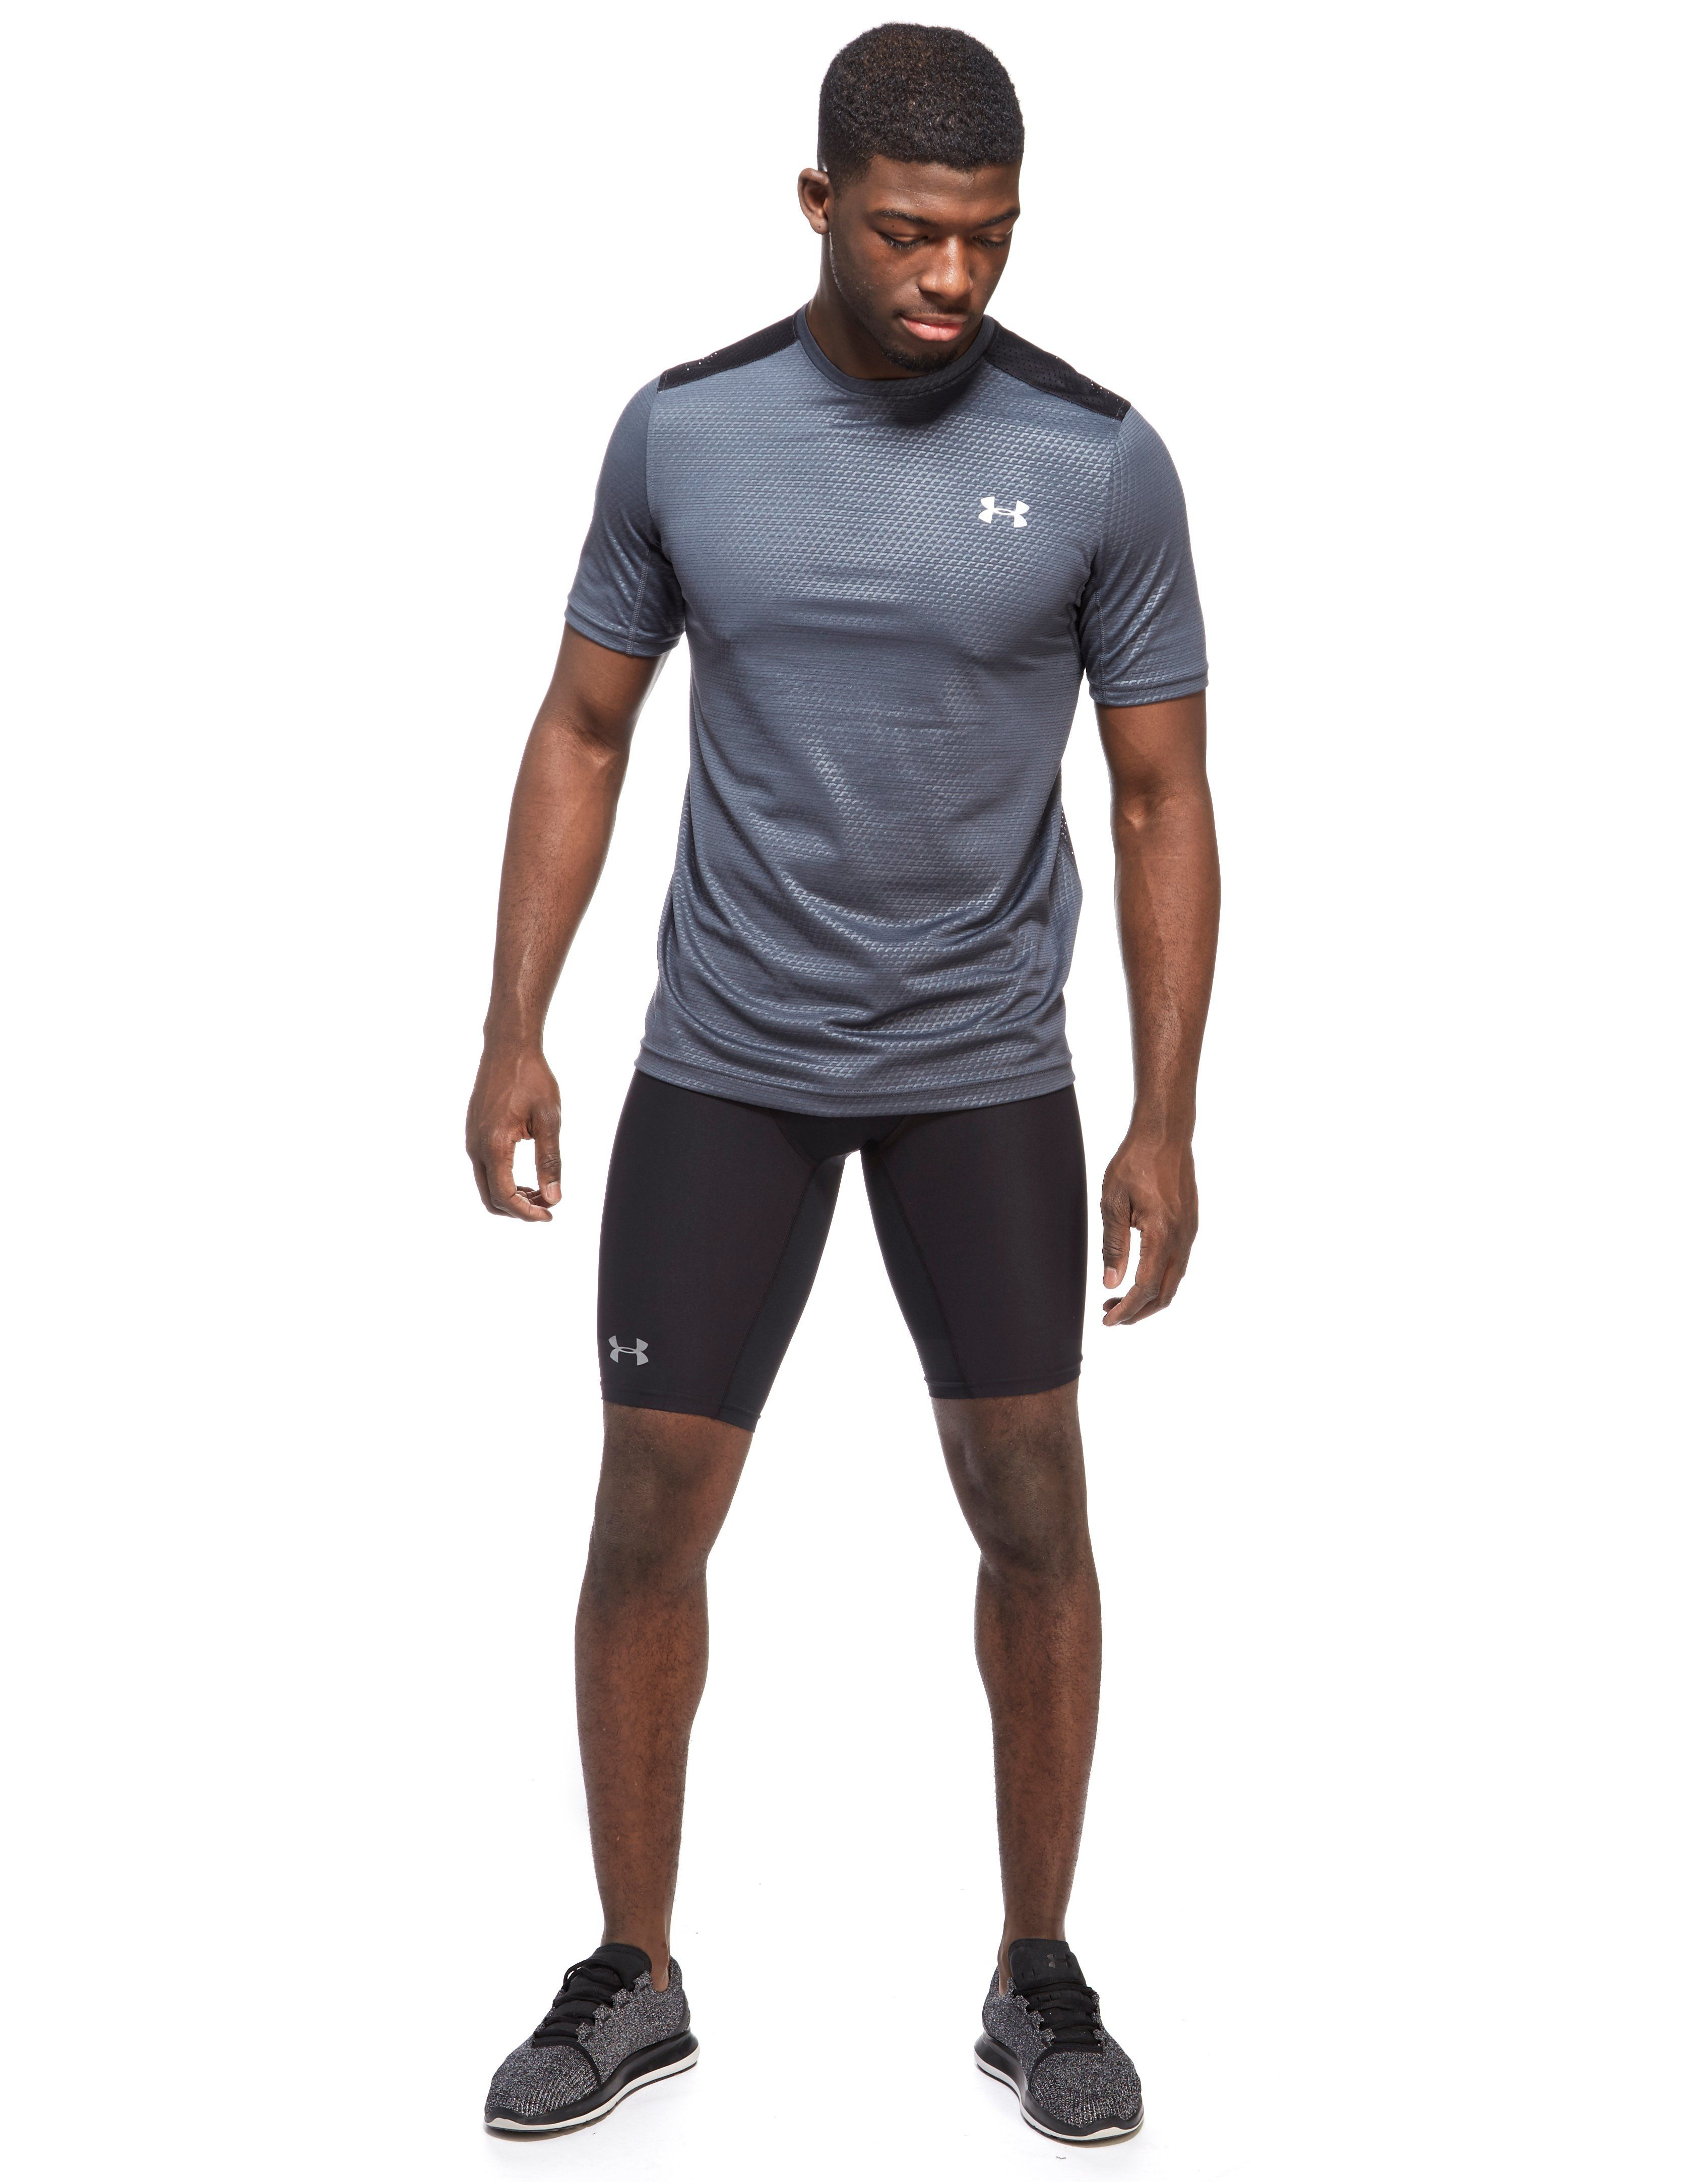 Under Armour HeatGear Armour Compression Shorts